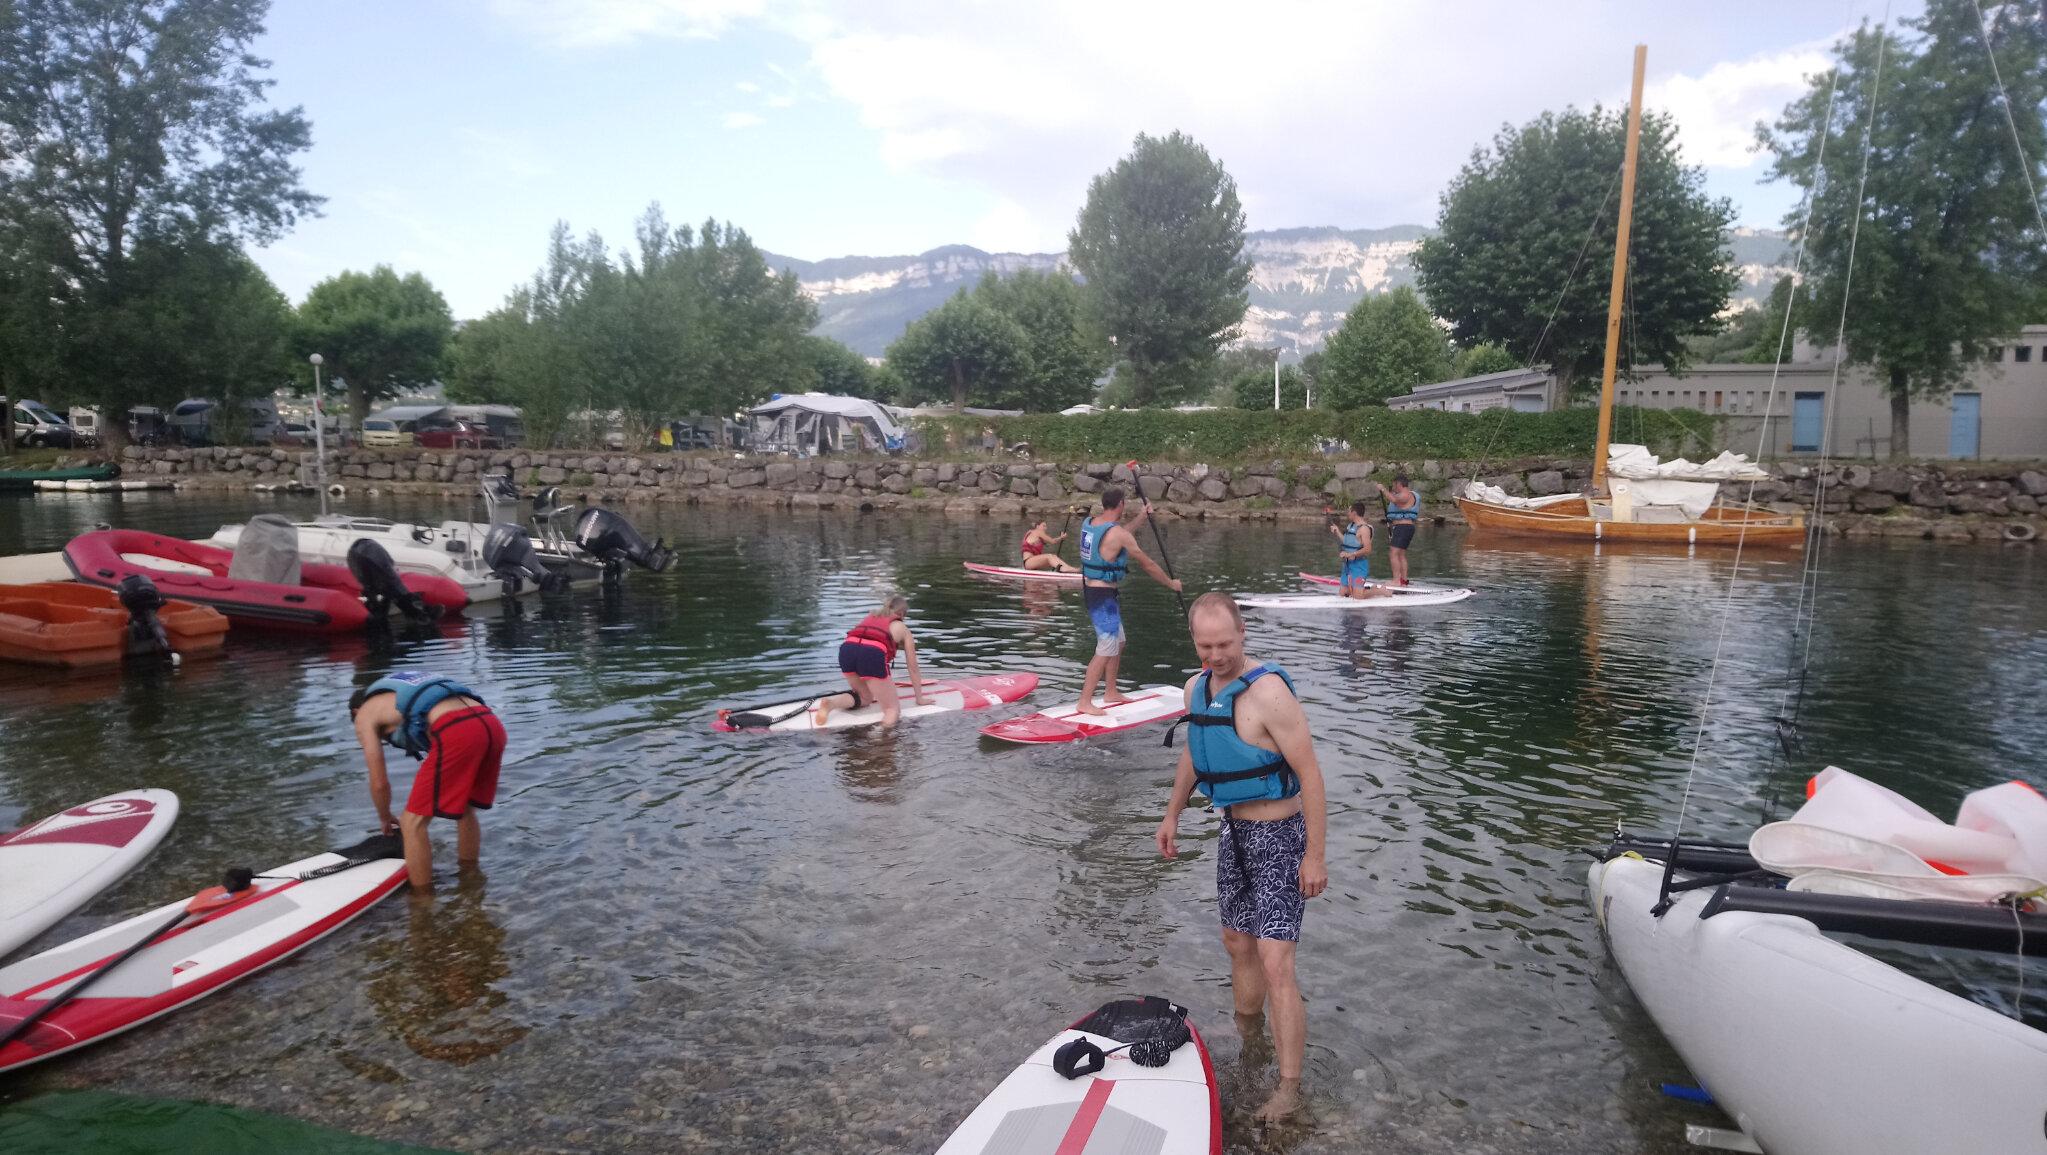 180704-004 Paddle